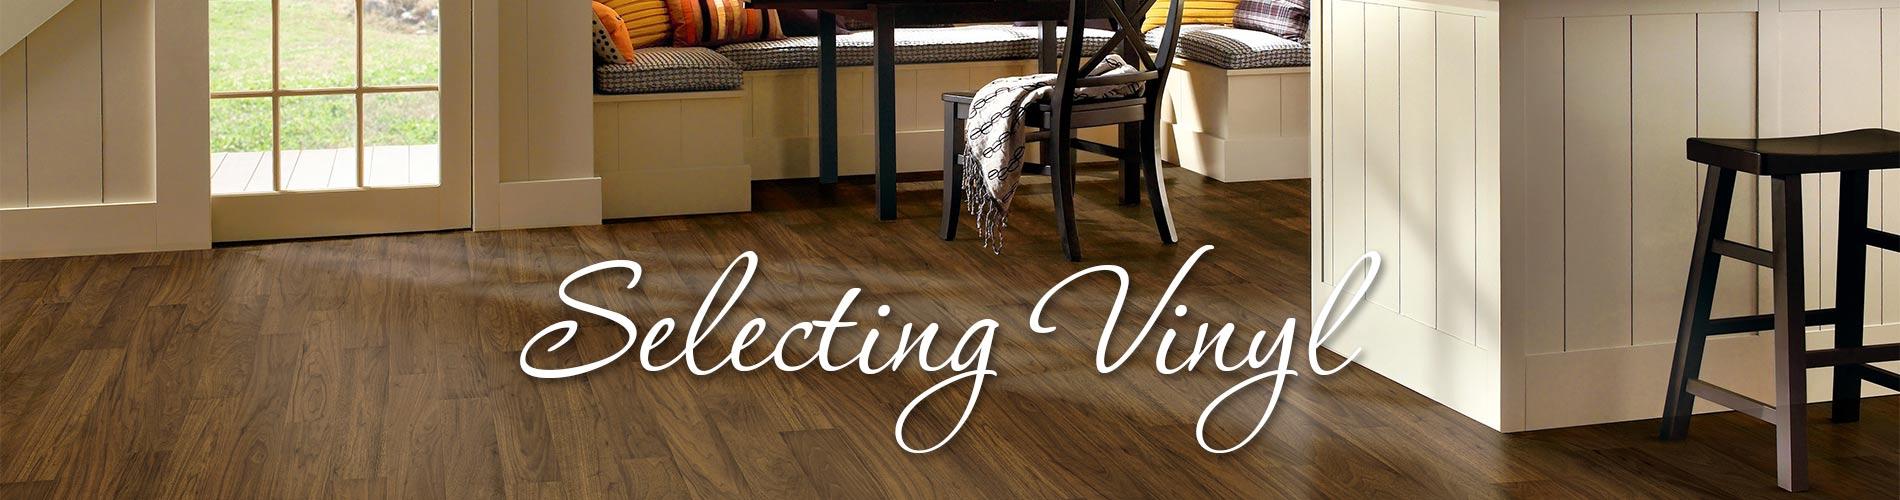 Selecting Vinyl Flooring From Abbey Carpet Amp Floor